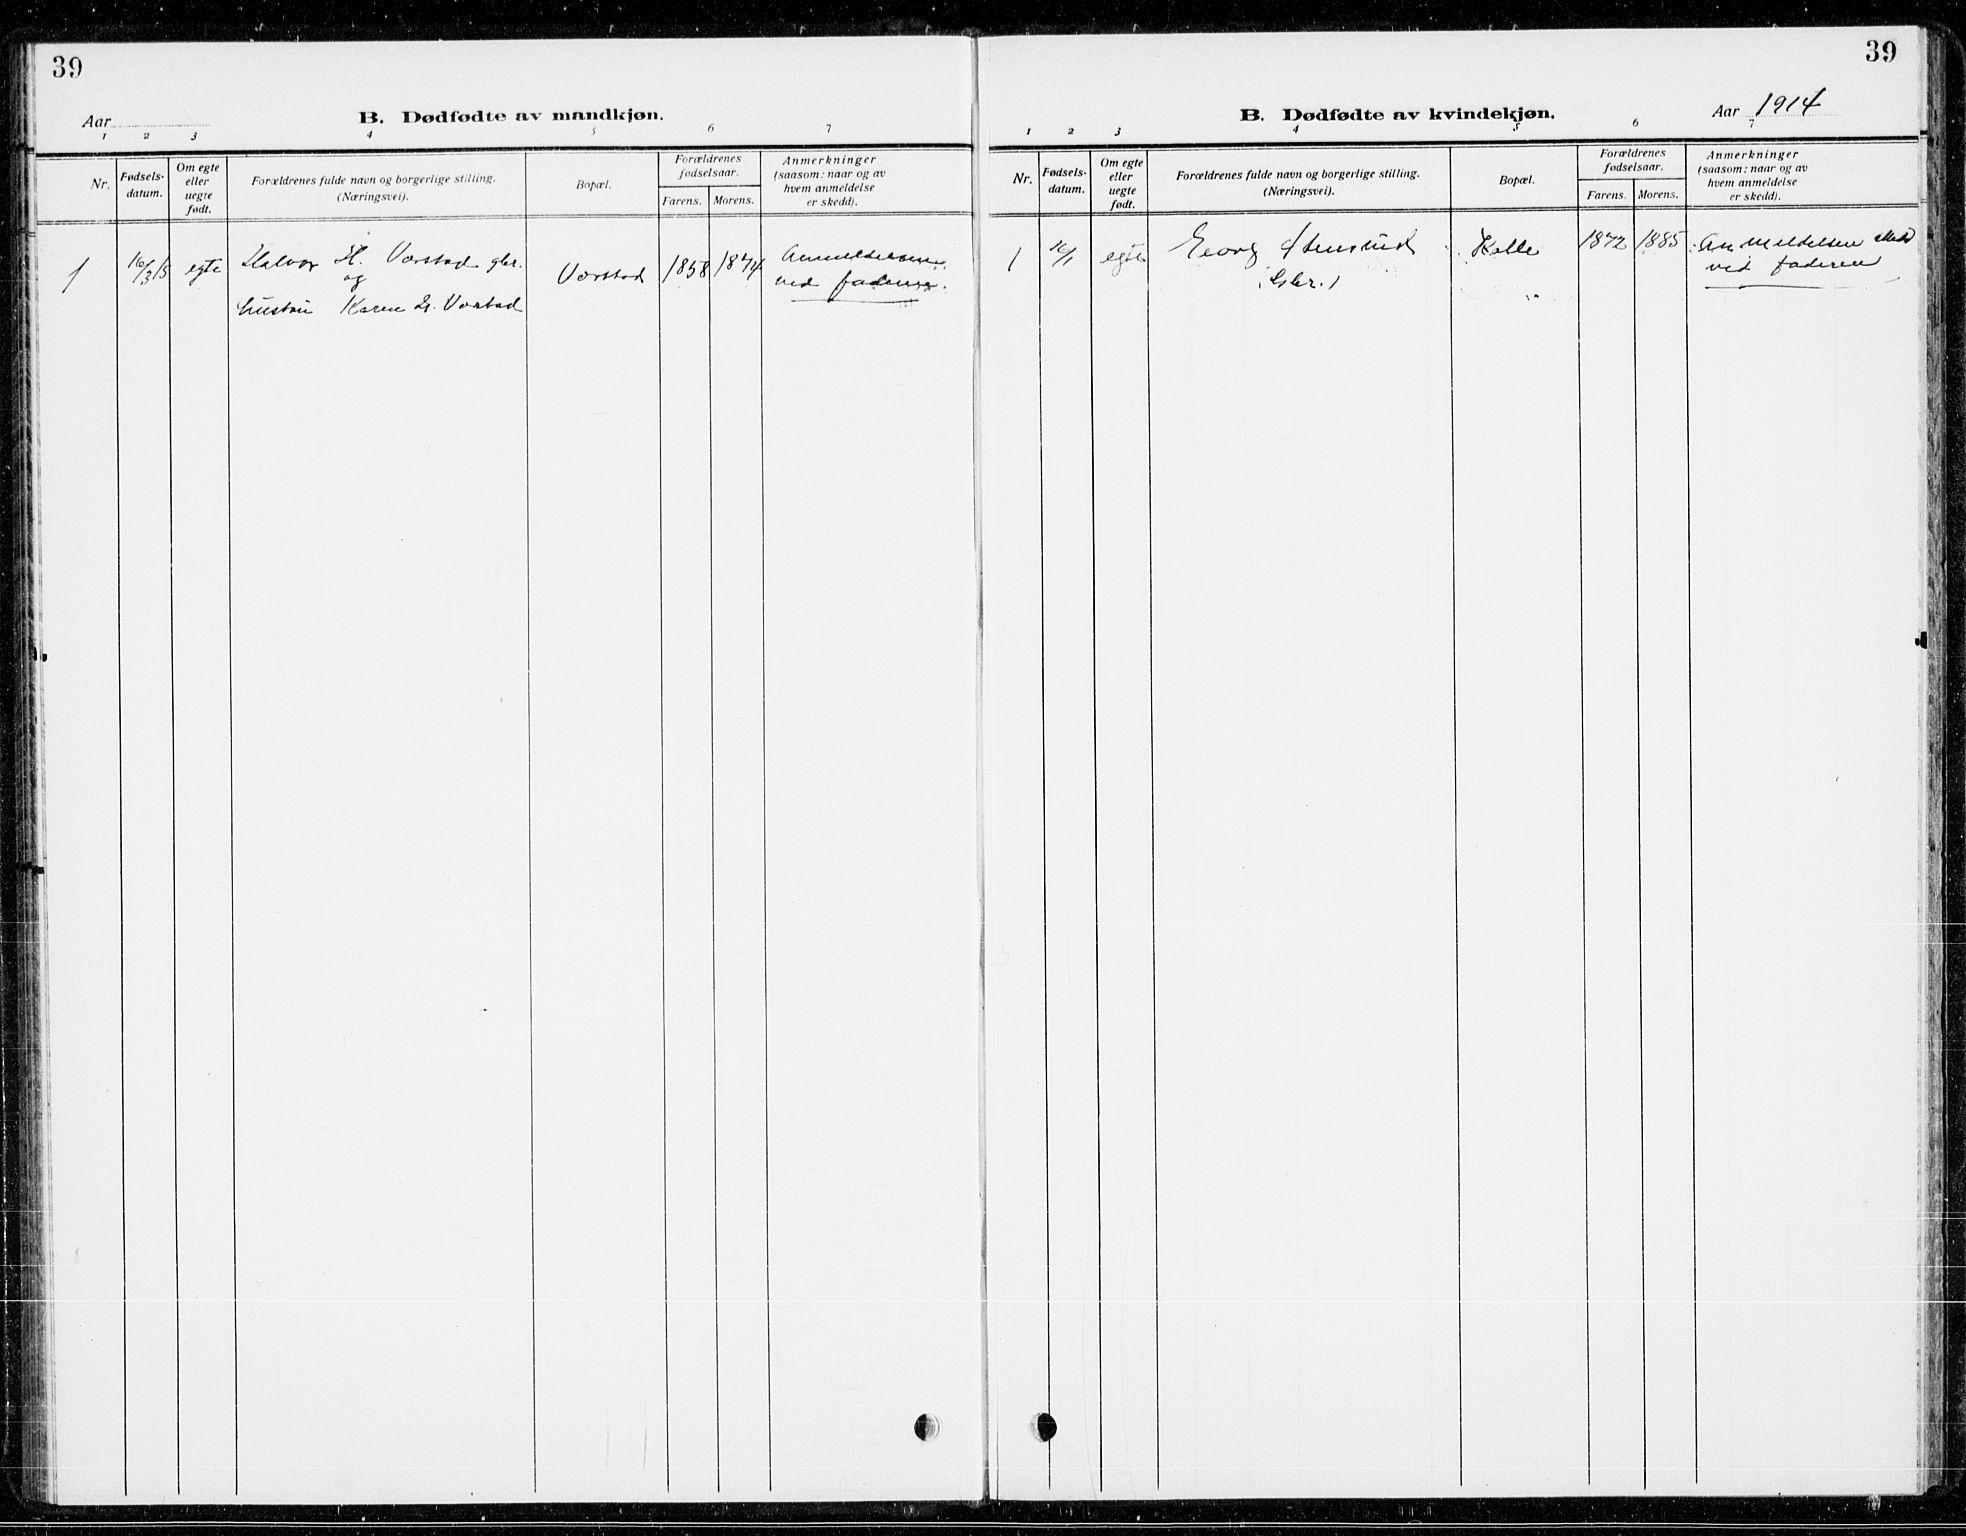 SAKO, Holla kirkebøker, G/Gb/L0003: Klokkerbok nr. II 3, 1914-1941, s. 39